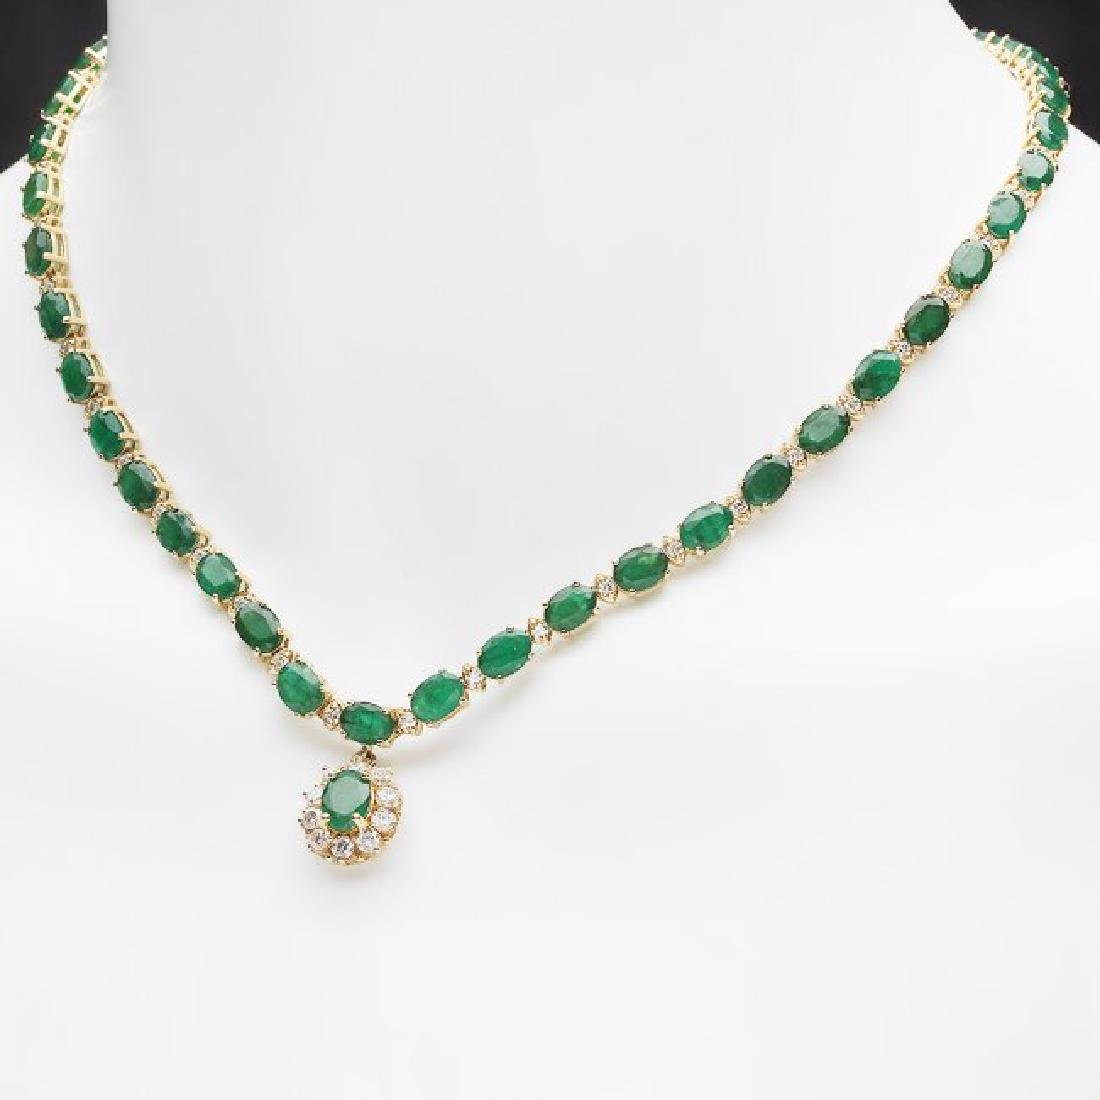 14k Gold 24.25ct Emerald 2.00ct Diamond Necklace - 4